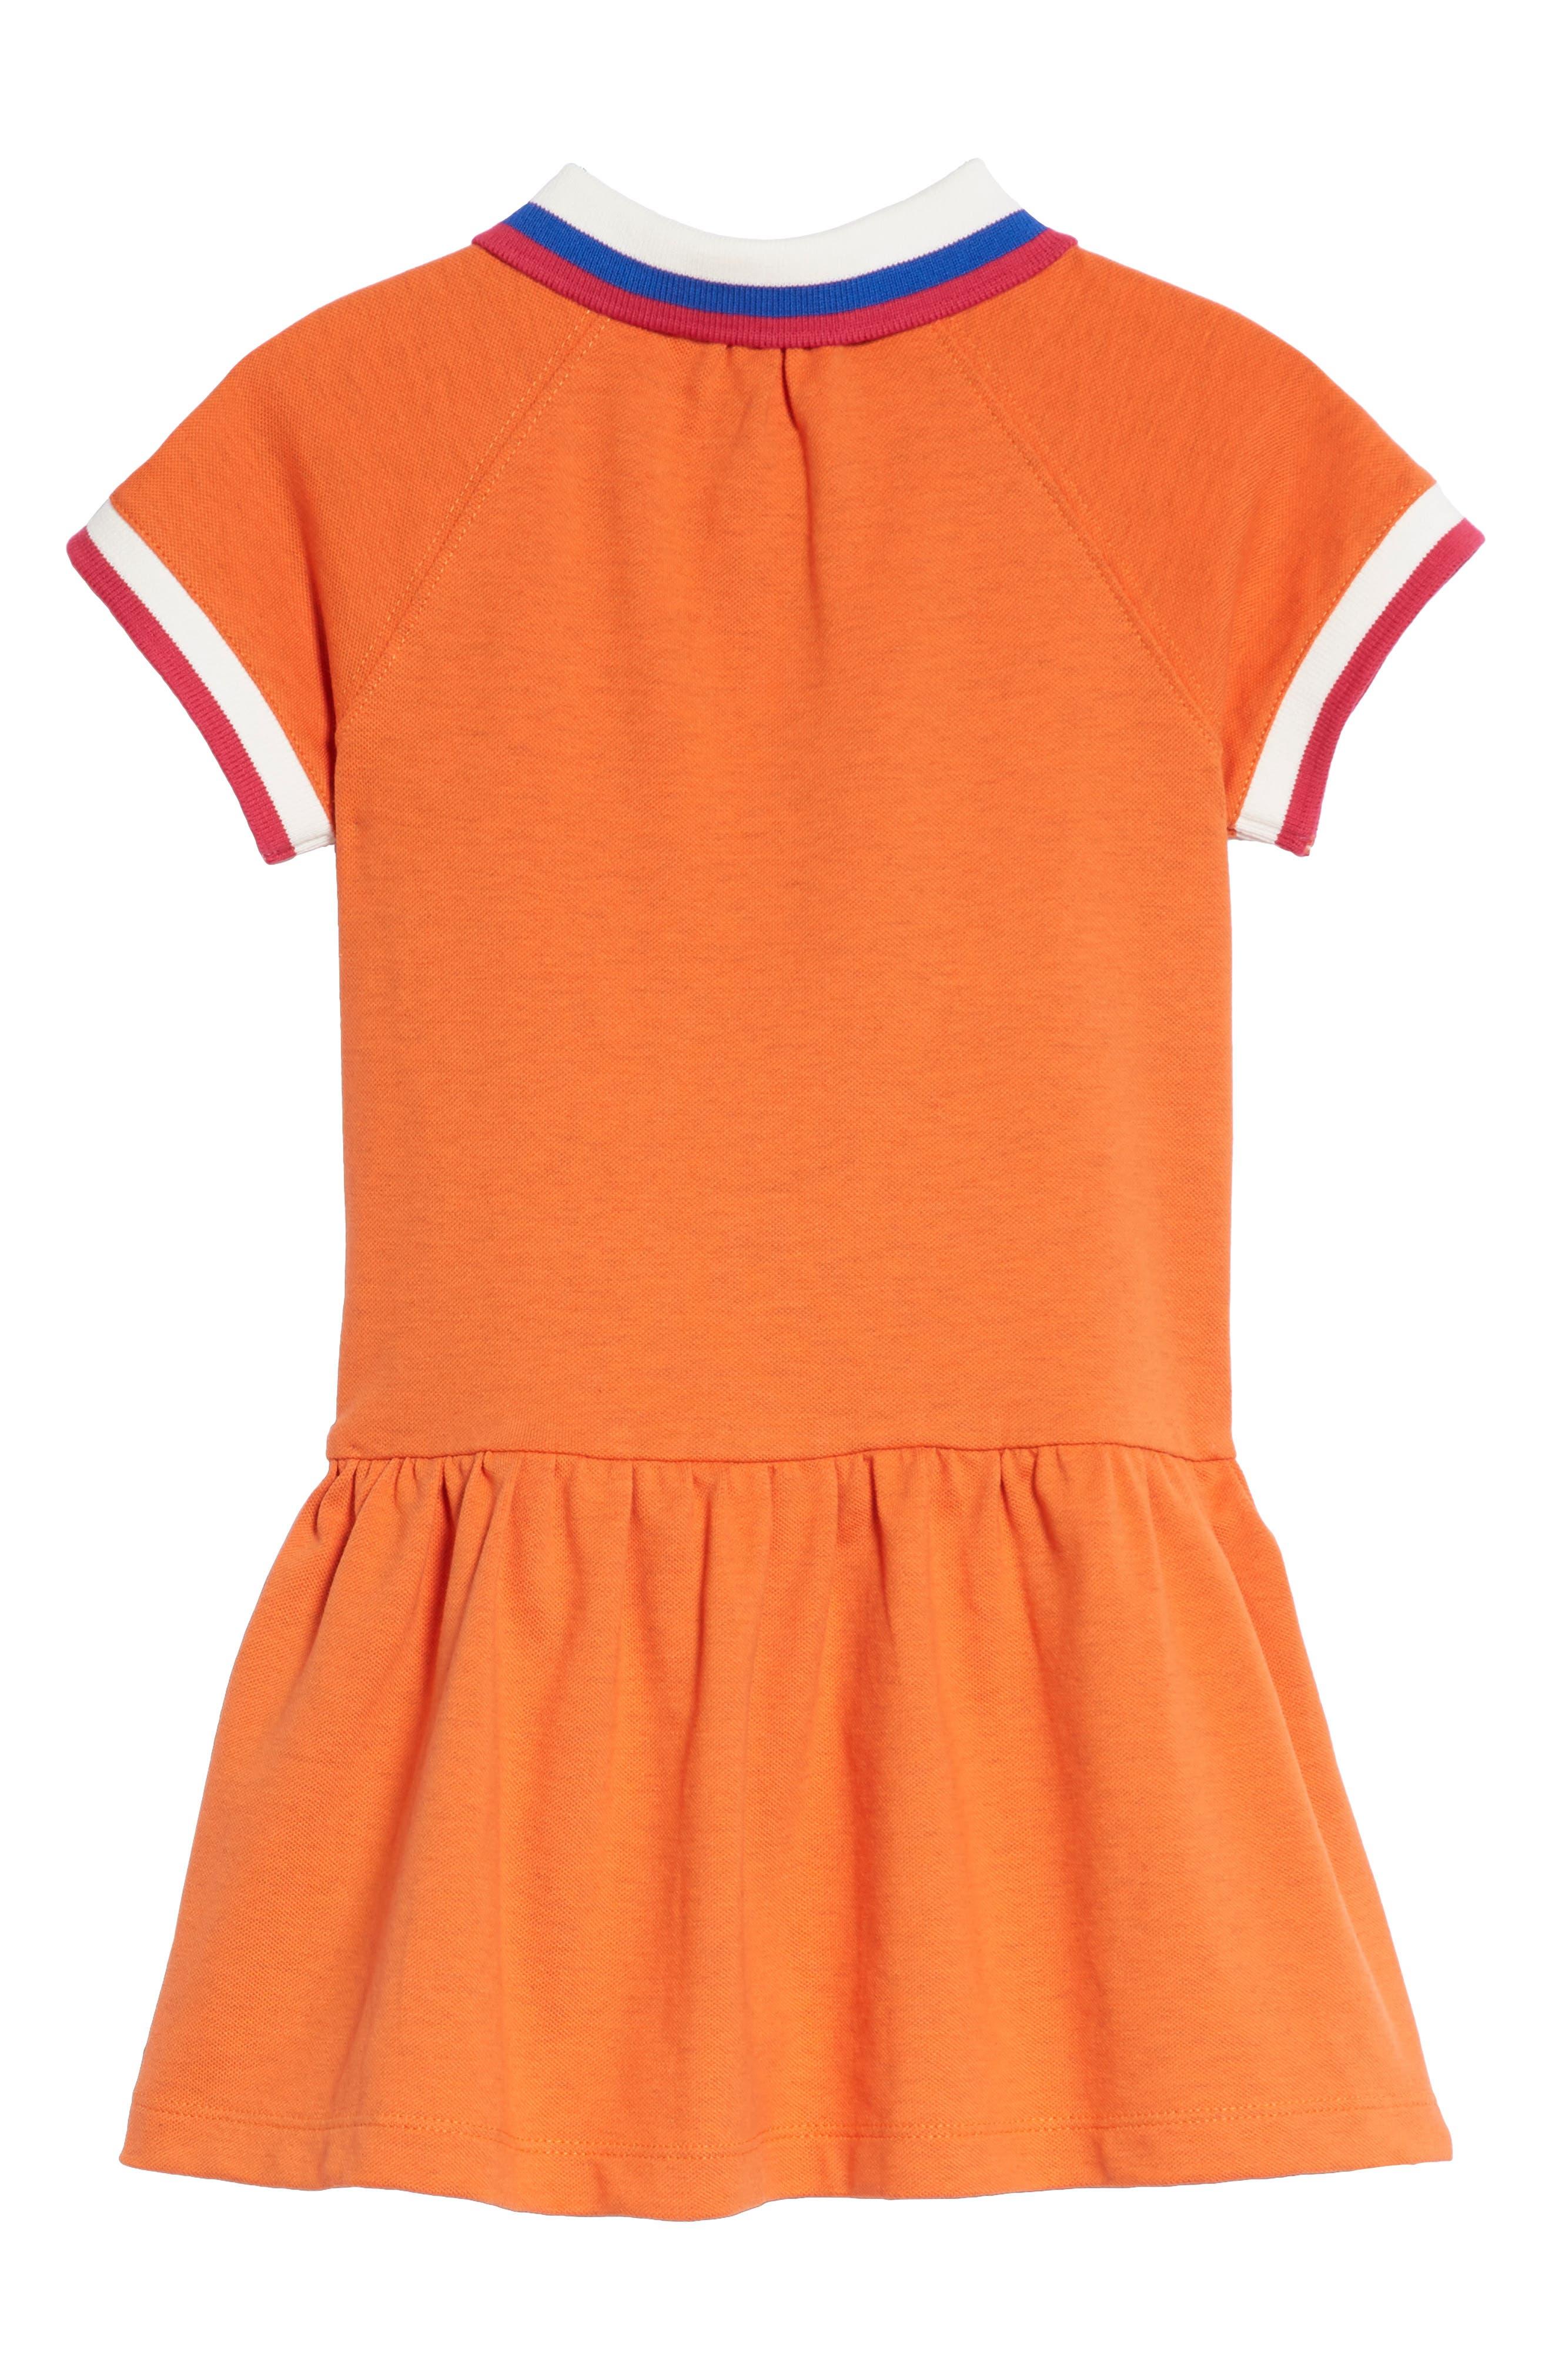 Burbery Cali Polo Dress,                             Alternate thumbnail 2, color,                             Brt Clementine Mel